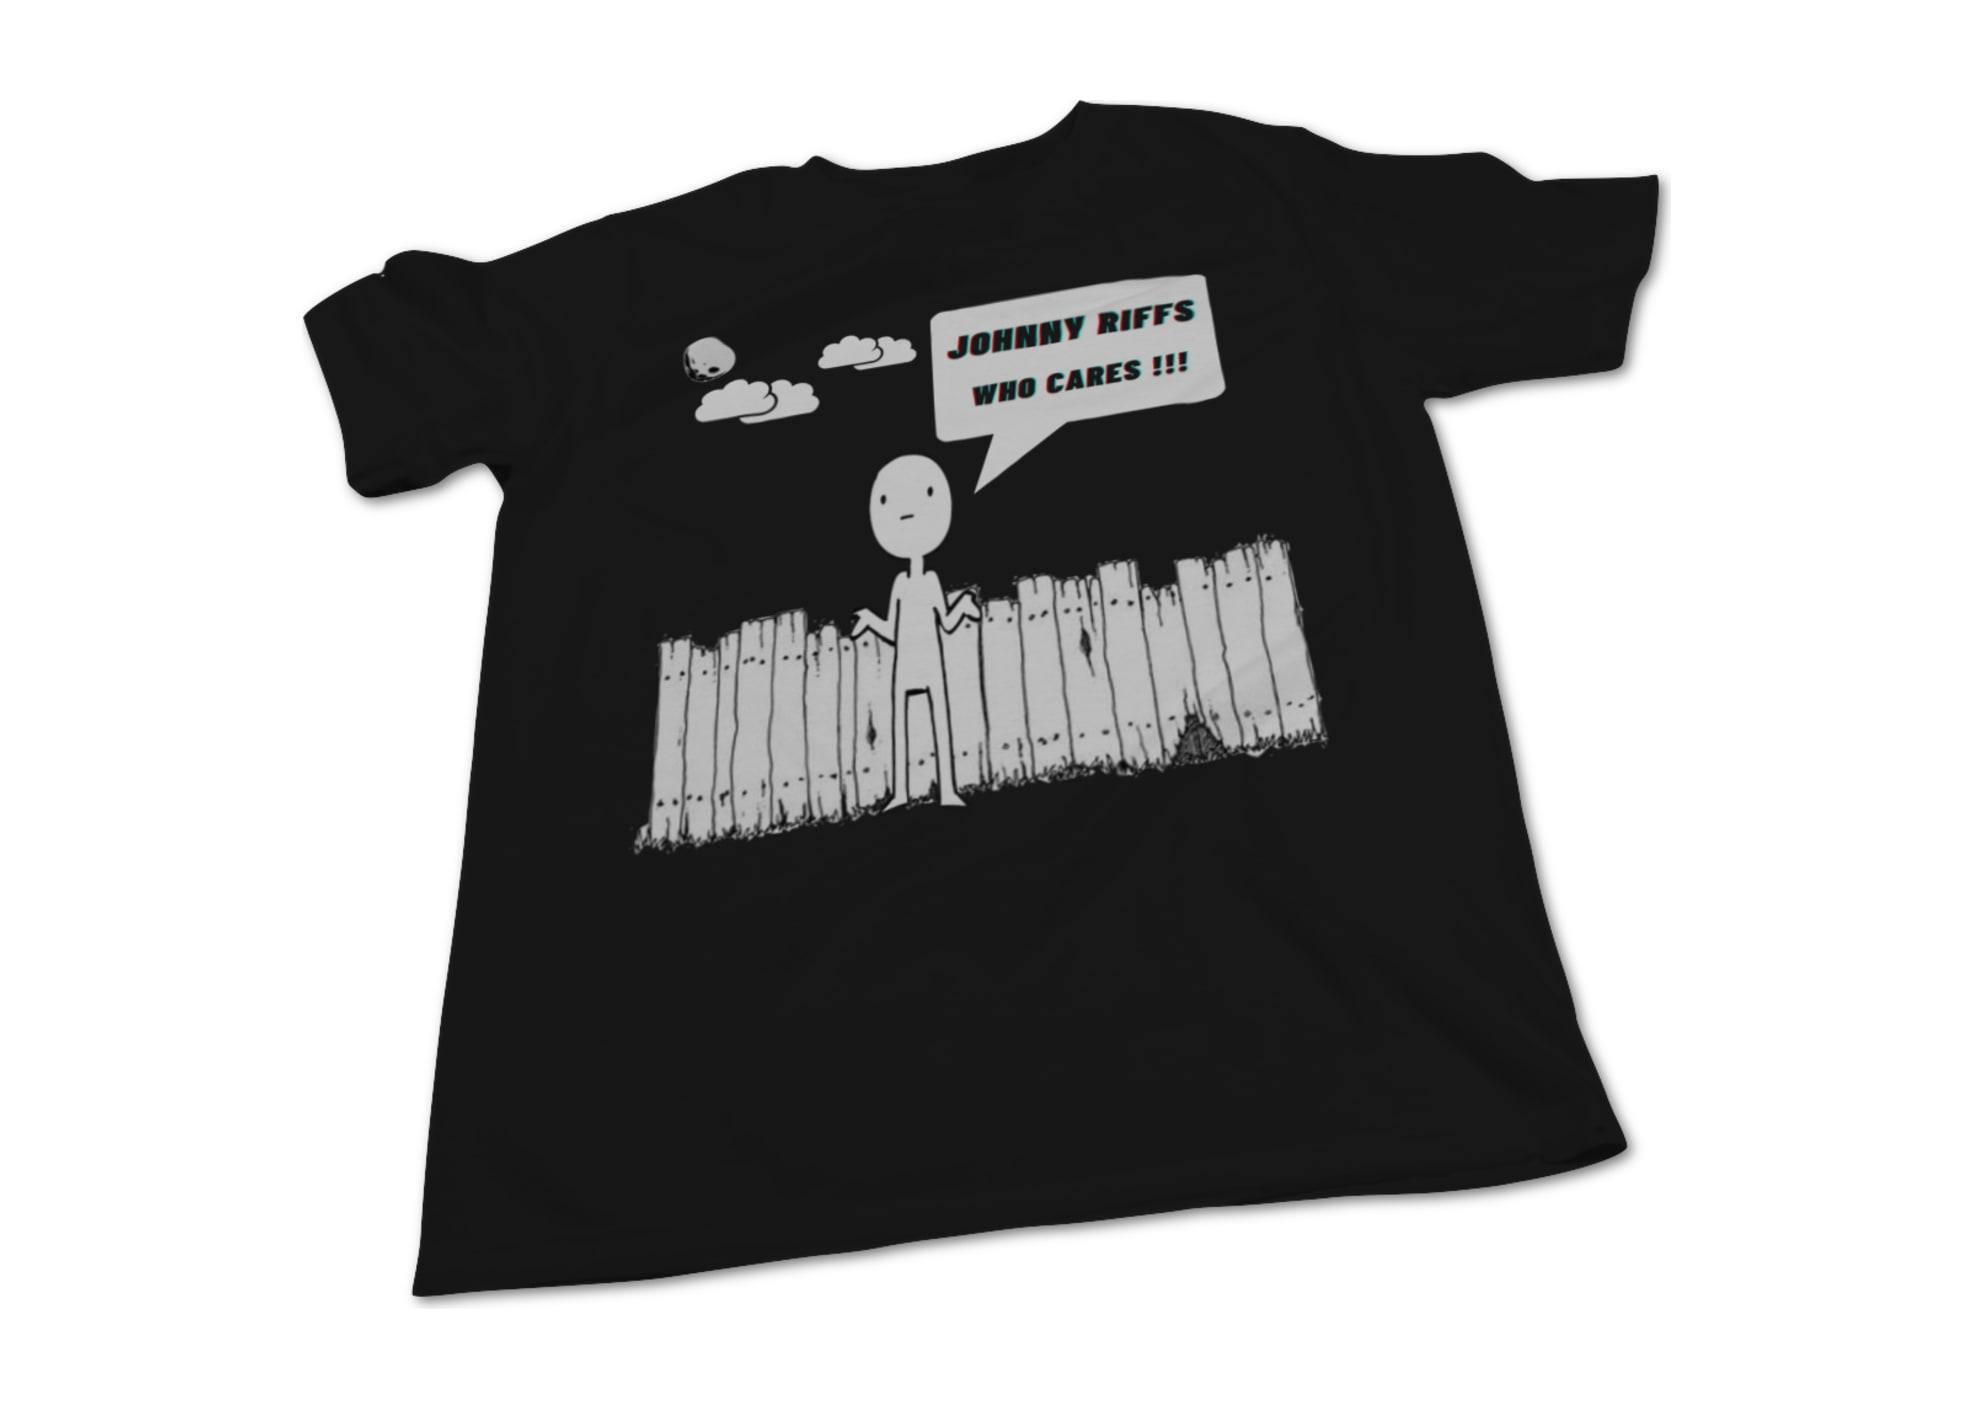 Johnny riffs who cares johnny riffs  who cares      logo 1603820025